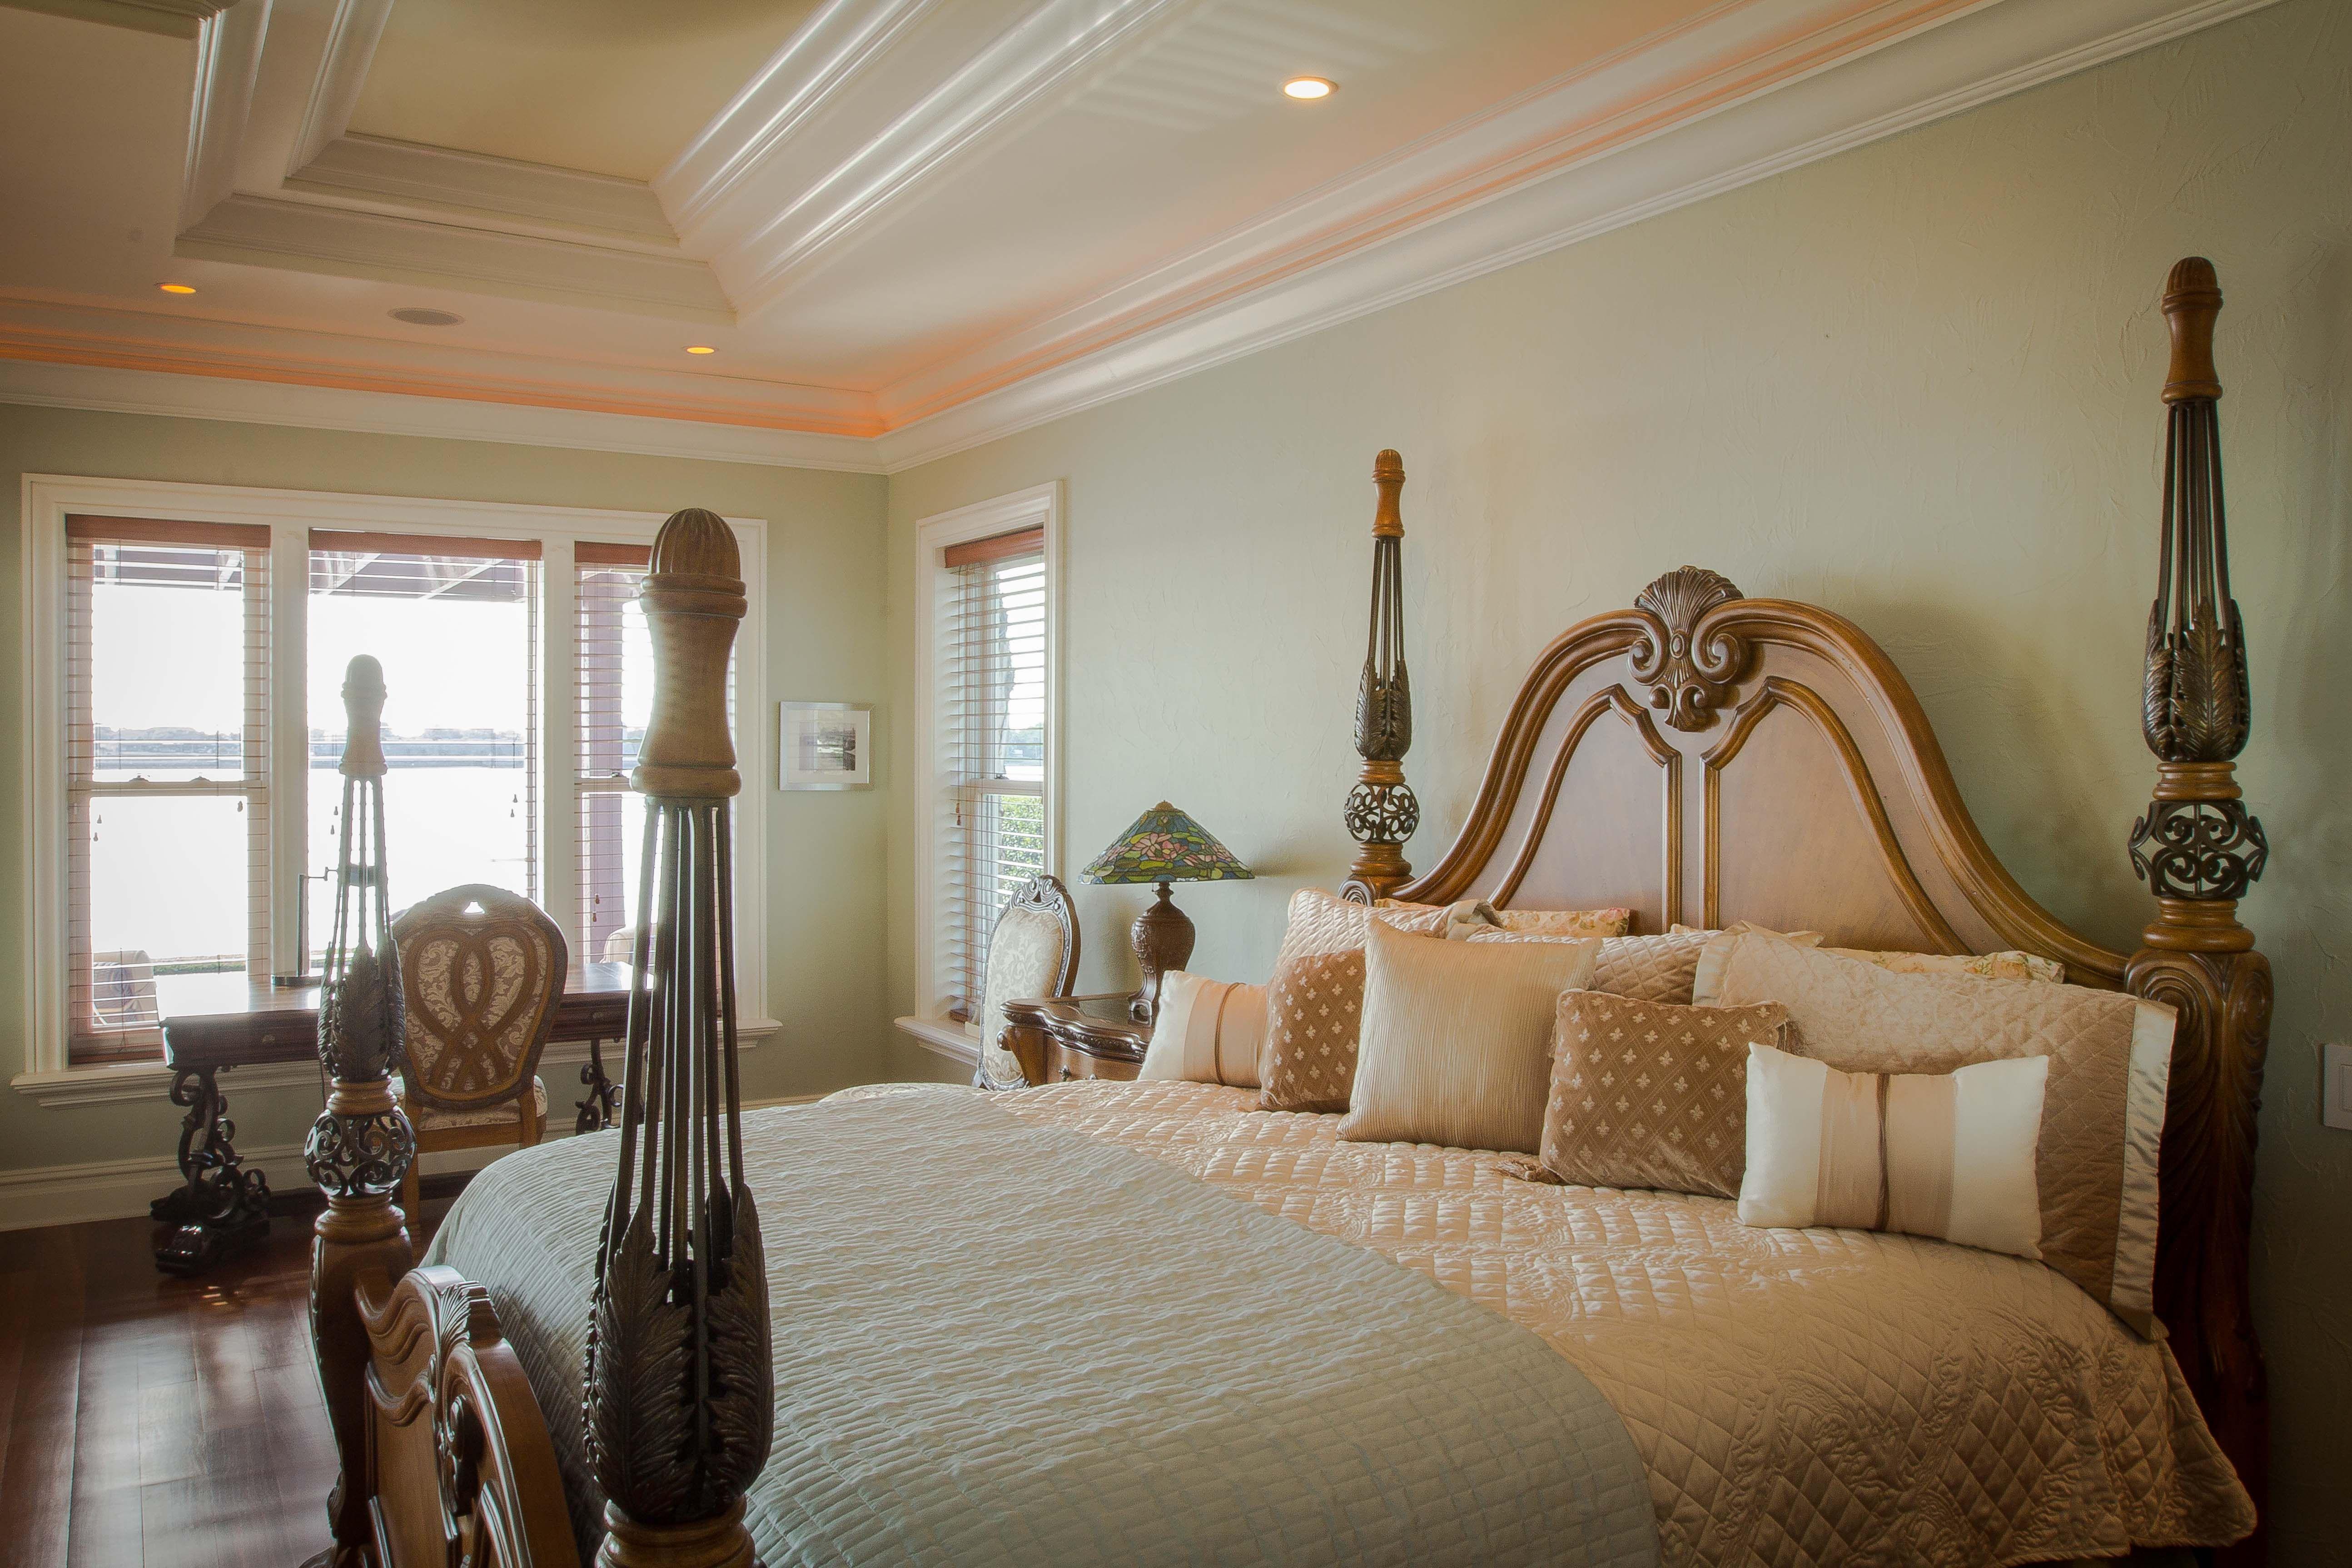 Master bedroom beautiful bedrooms and bathroom designs Pictures of master bedrooms and bathrooms